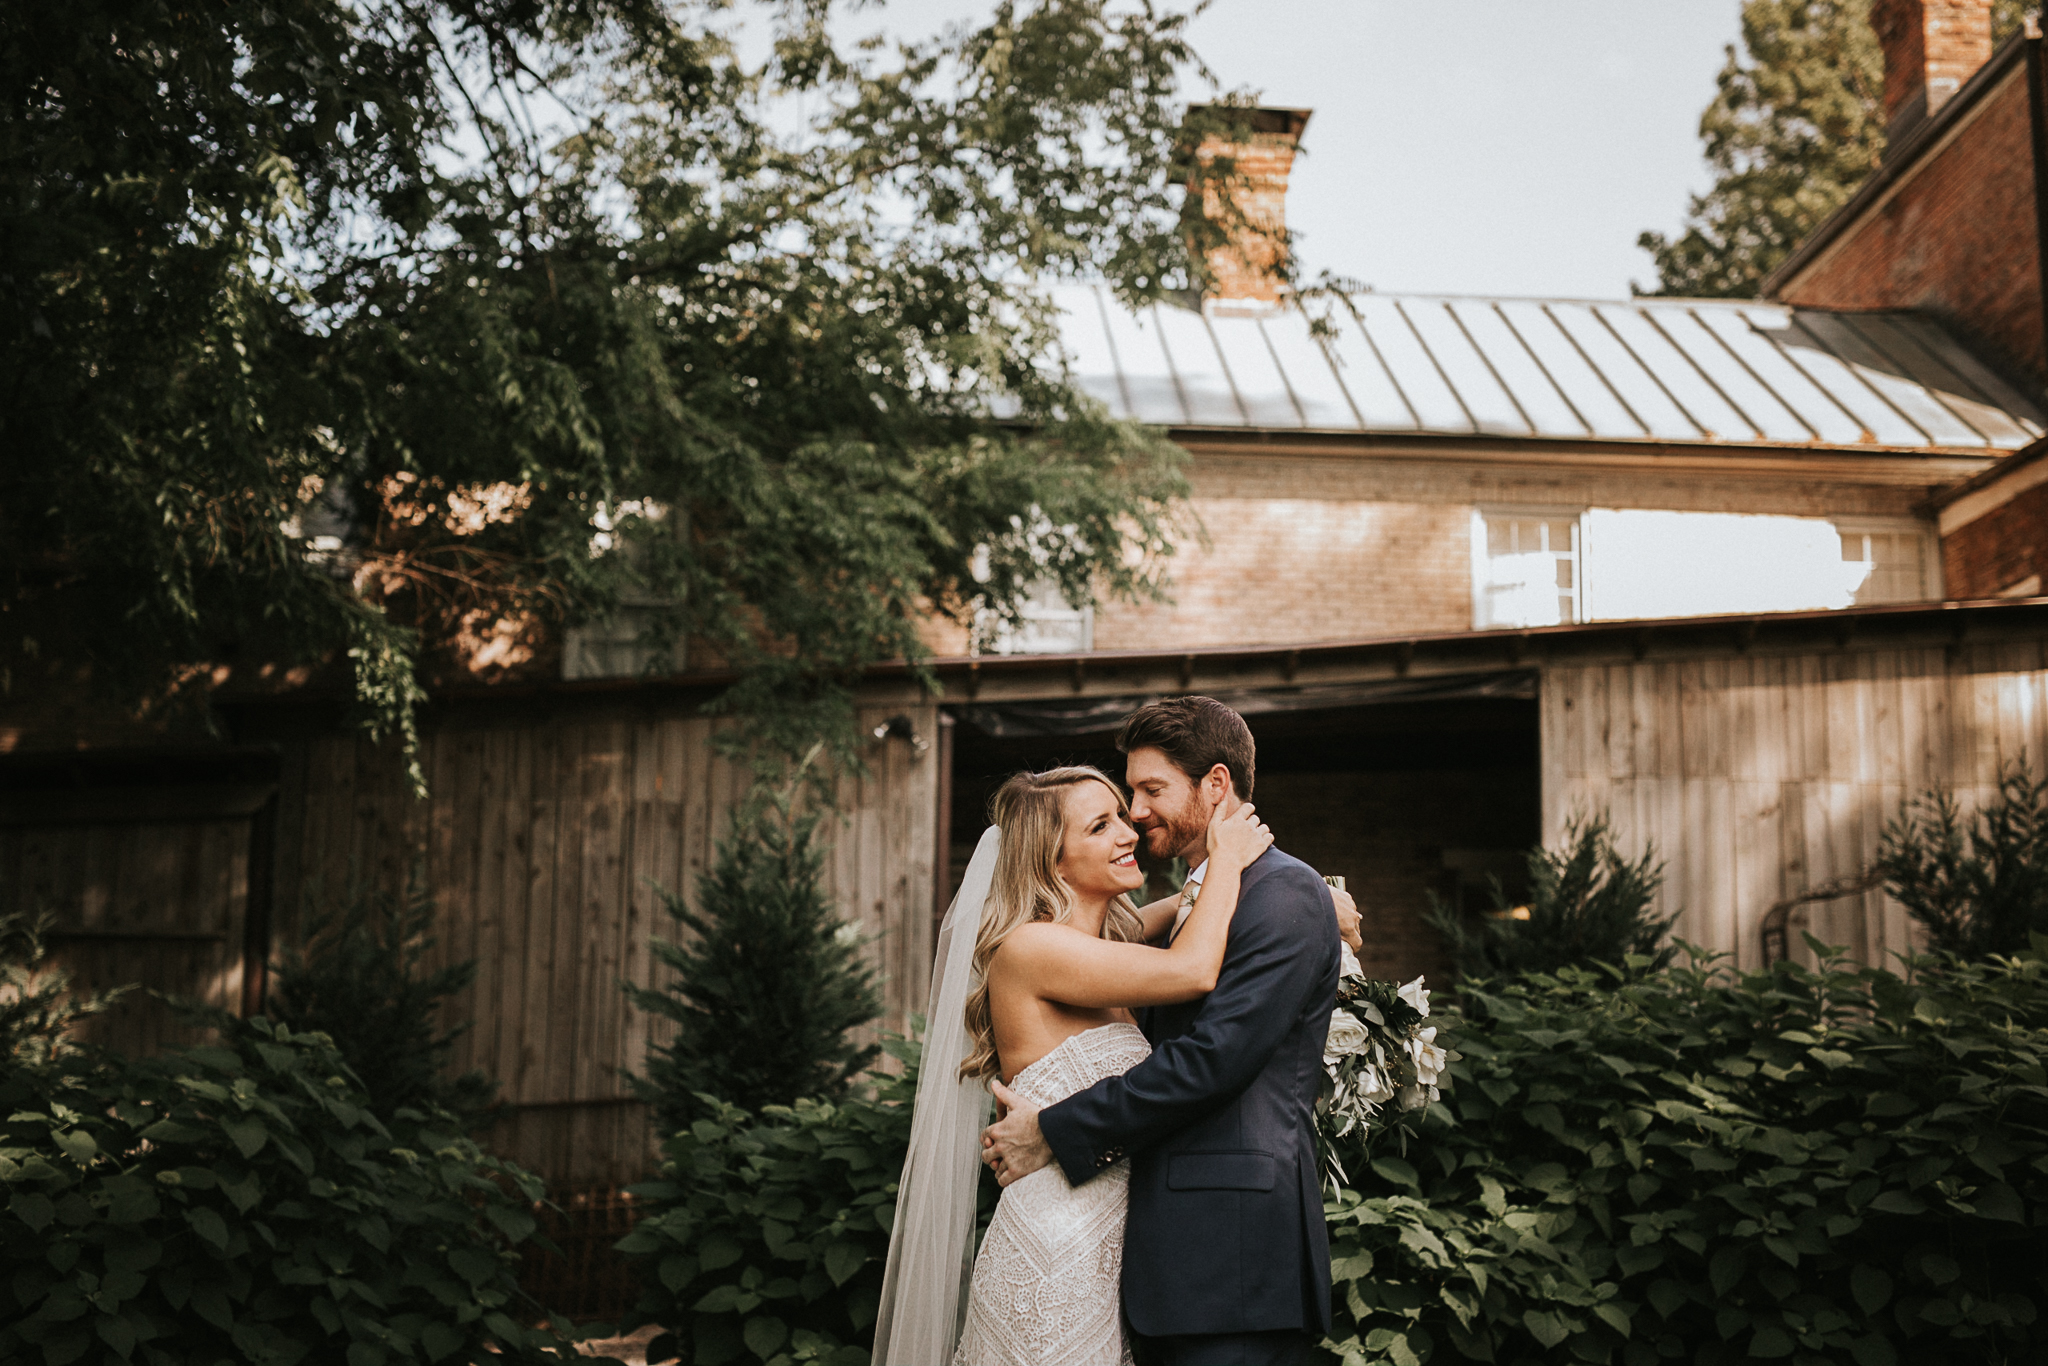 best-wedding-photographers-nashville-tn-10.jpg